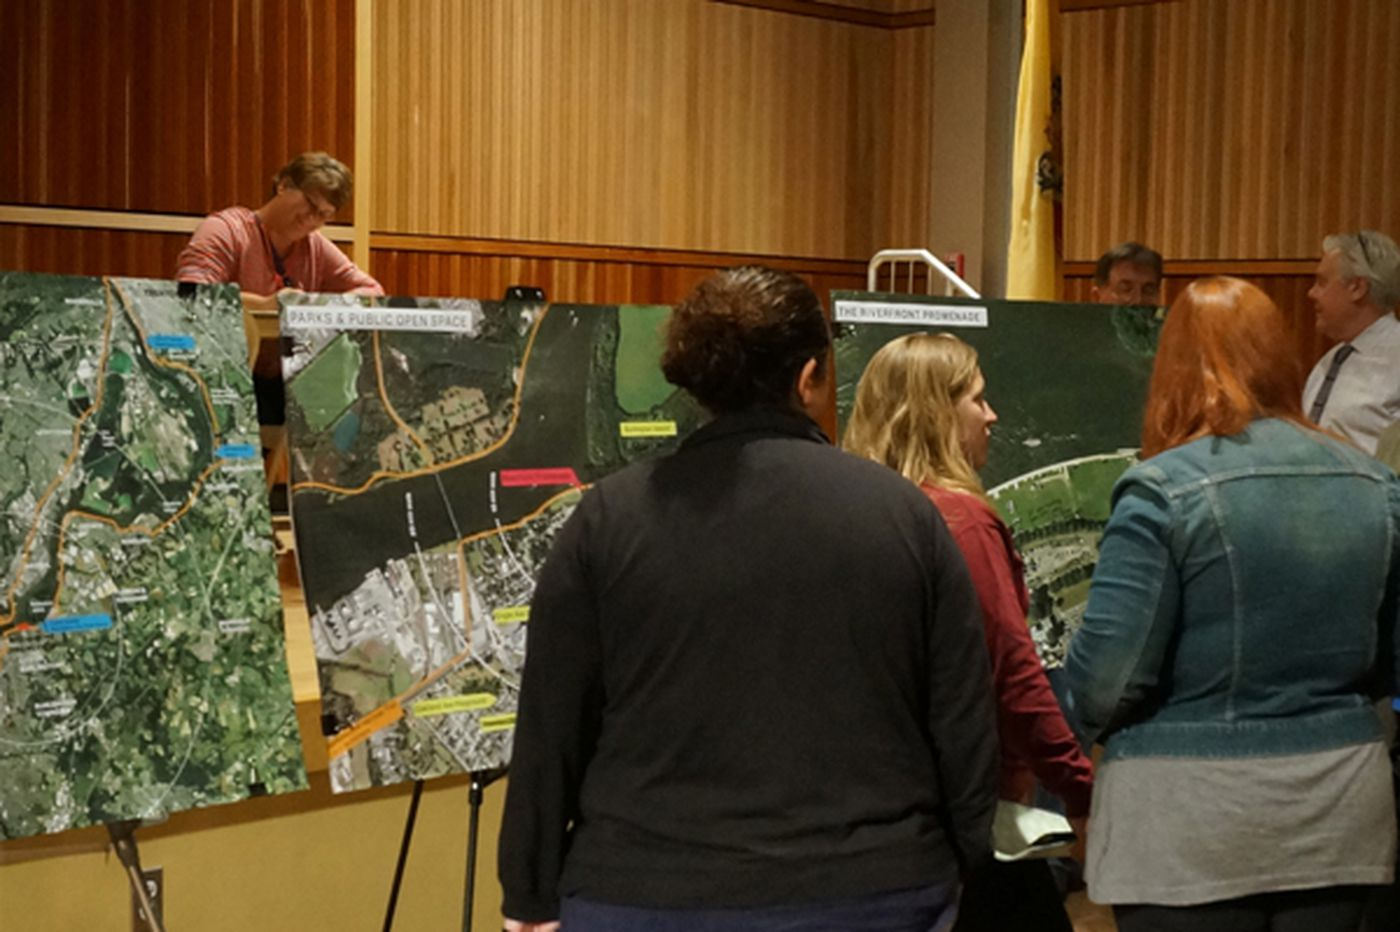 Public meeting on proposed promenade upgrade in Burlington City